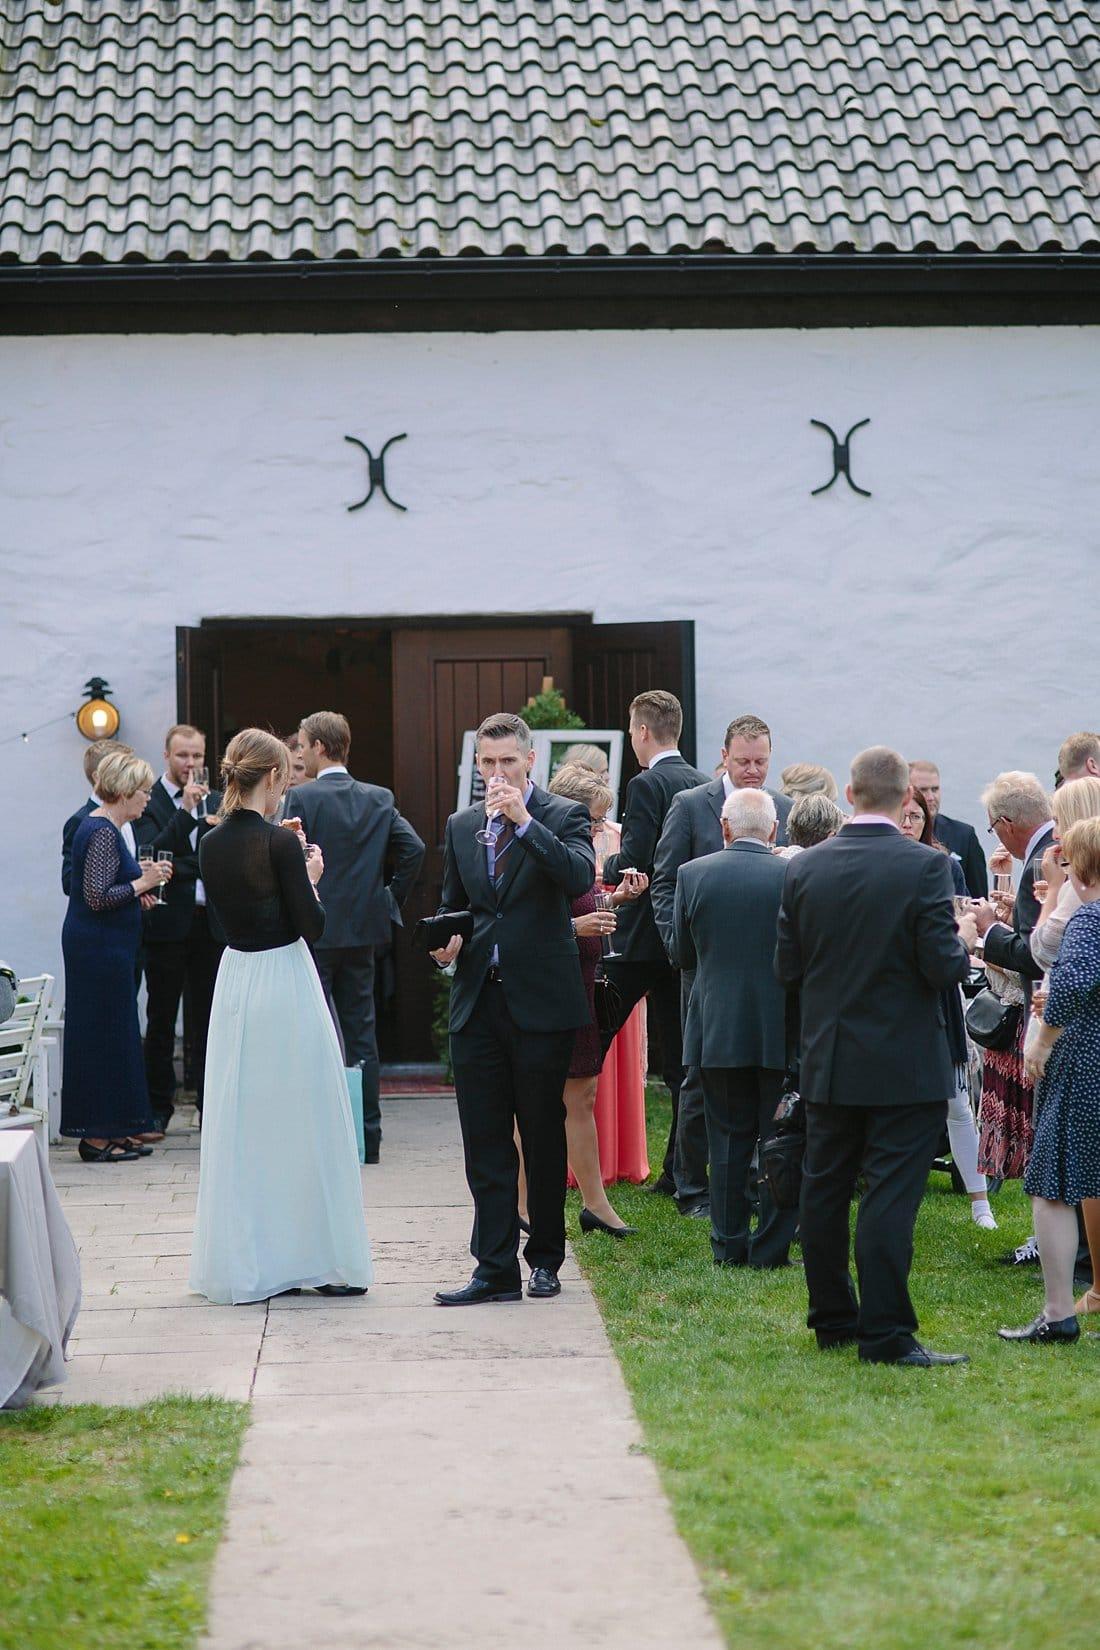 bröllop hellekis säteri smedjan